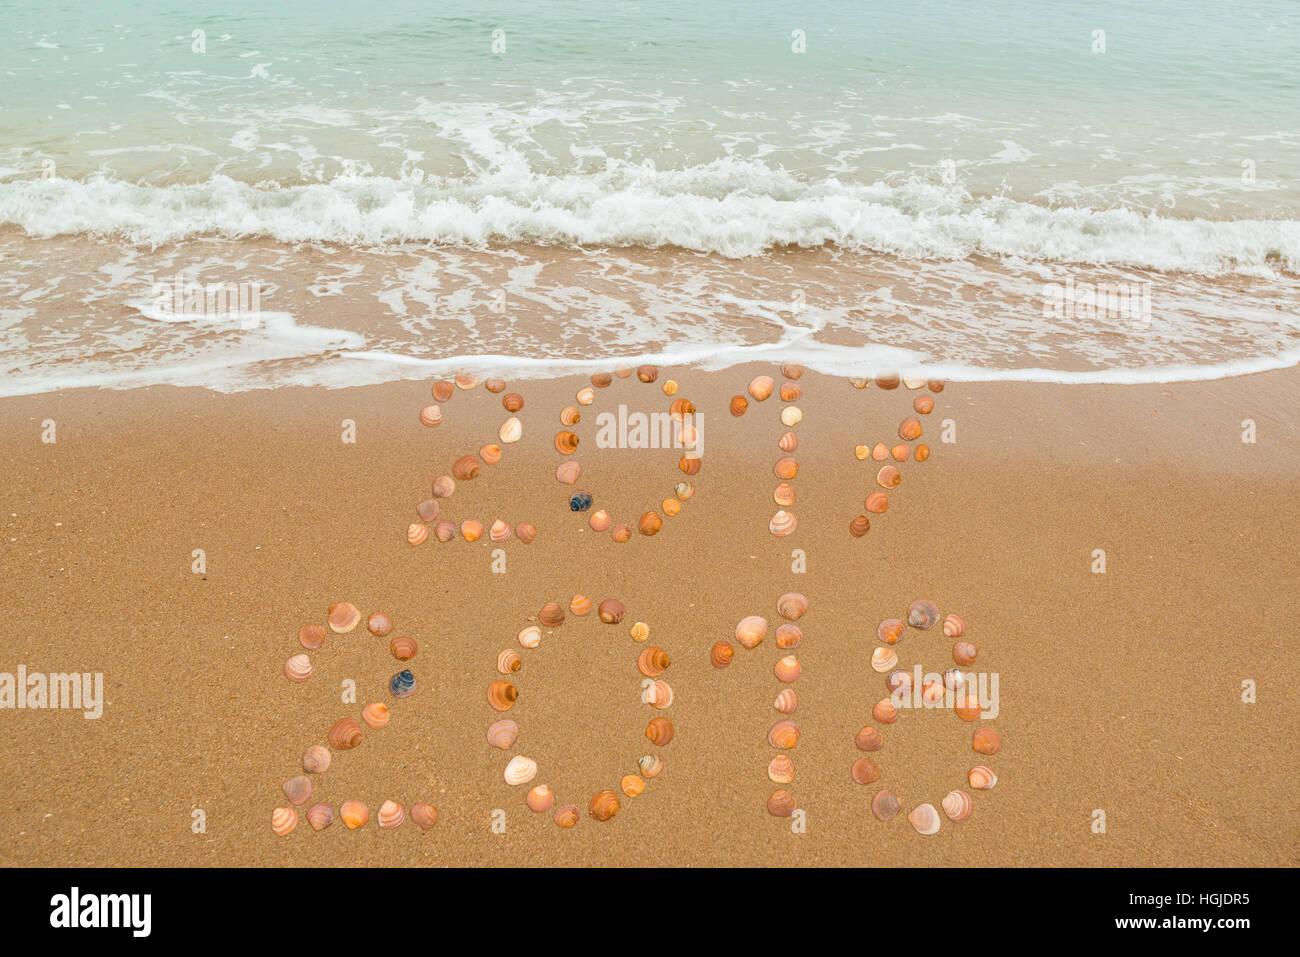 Happy New Year 2018 - Stock Image